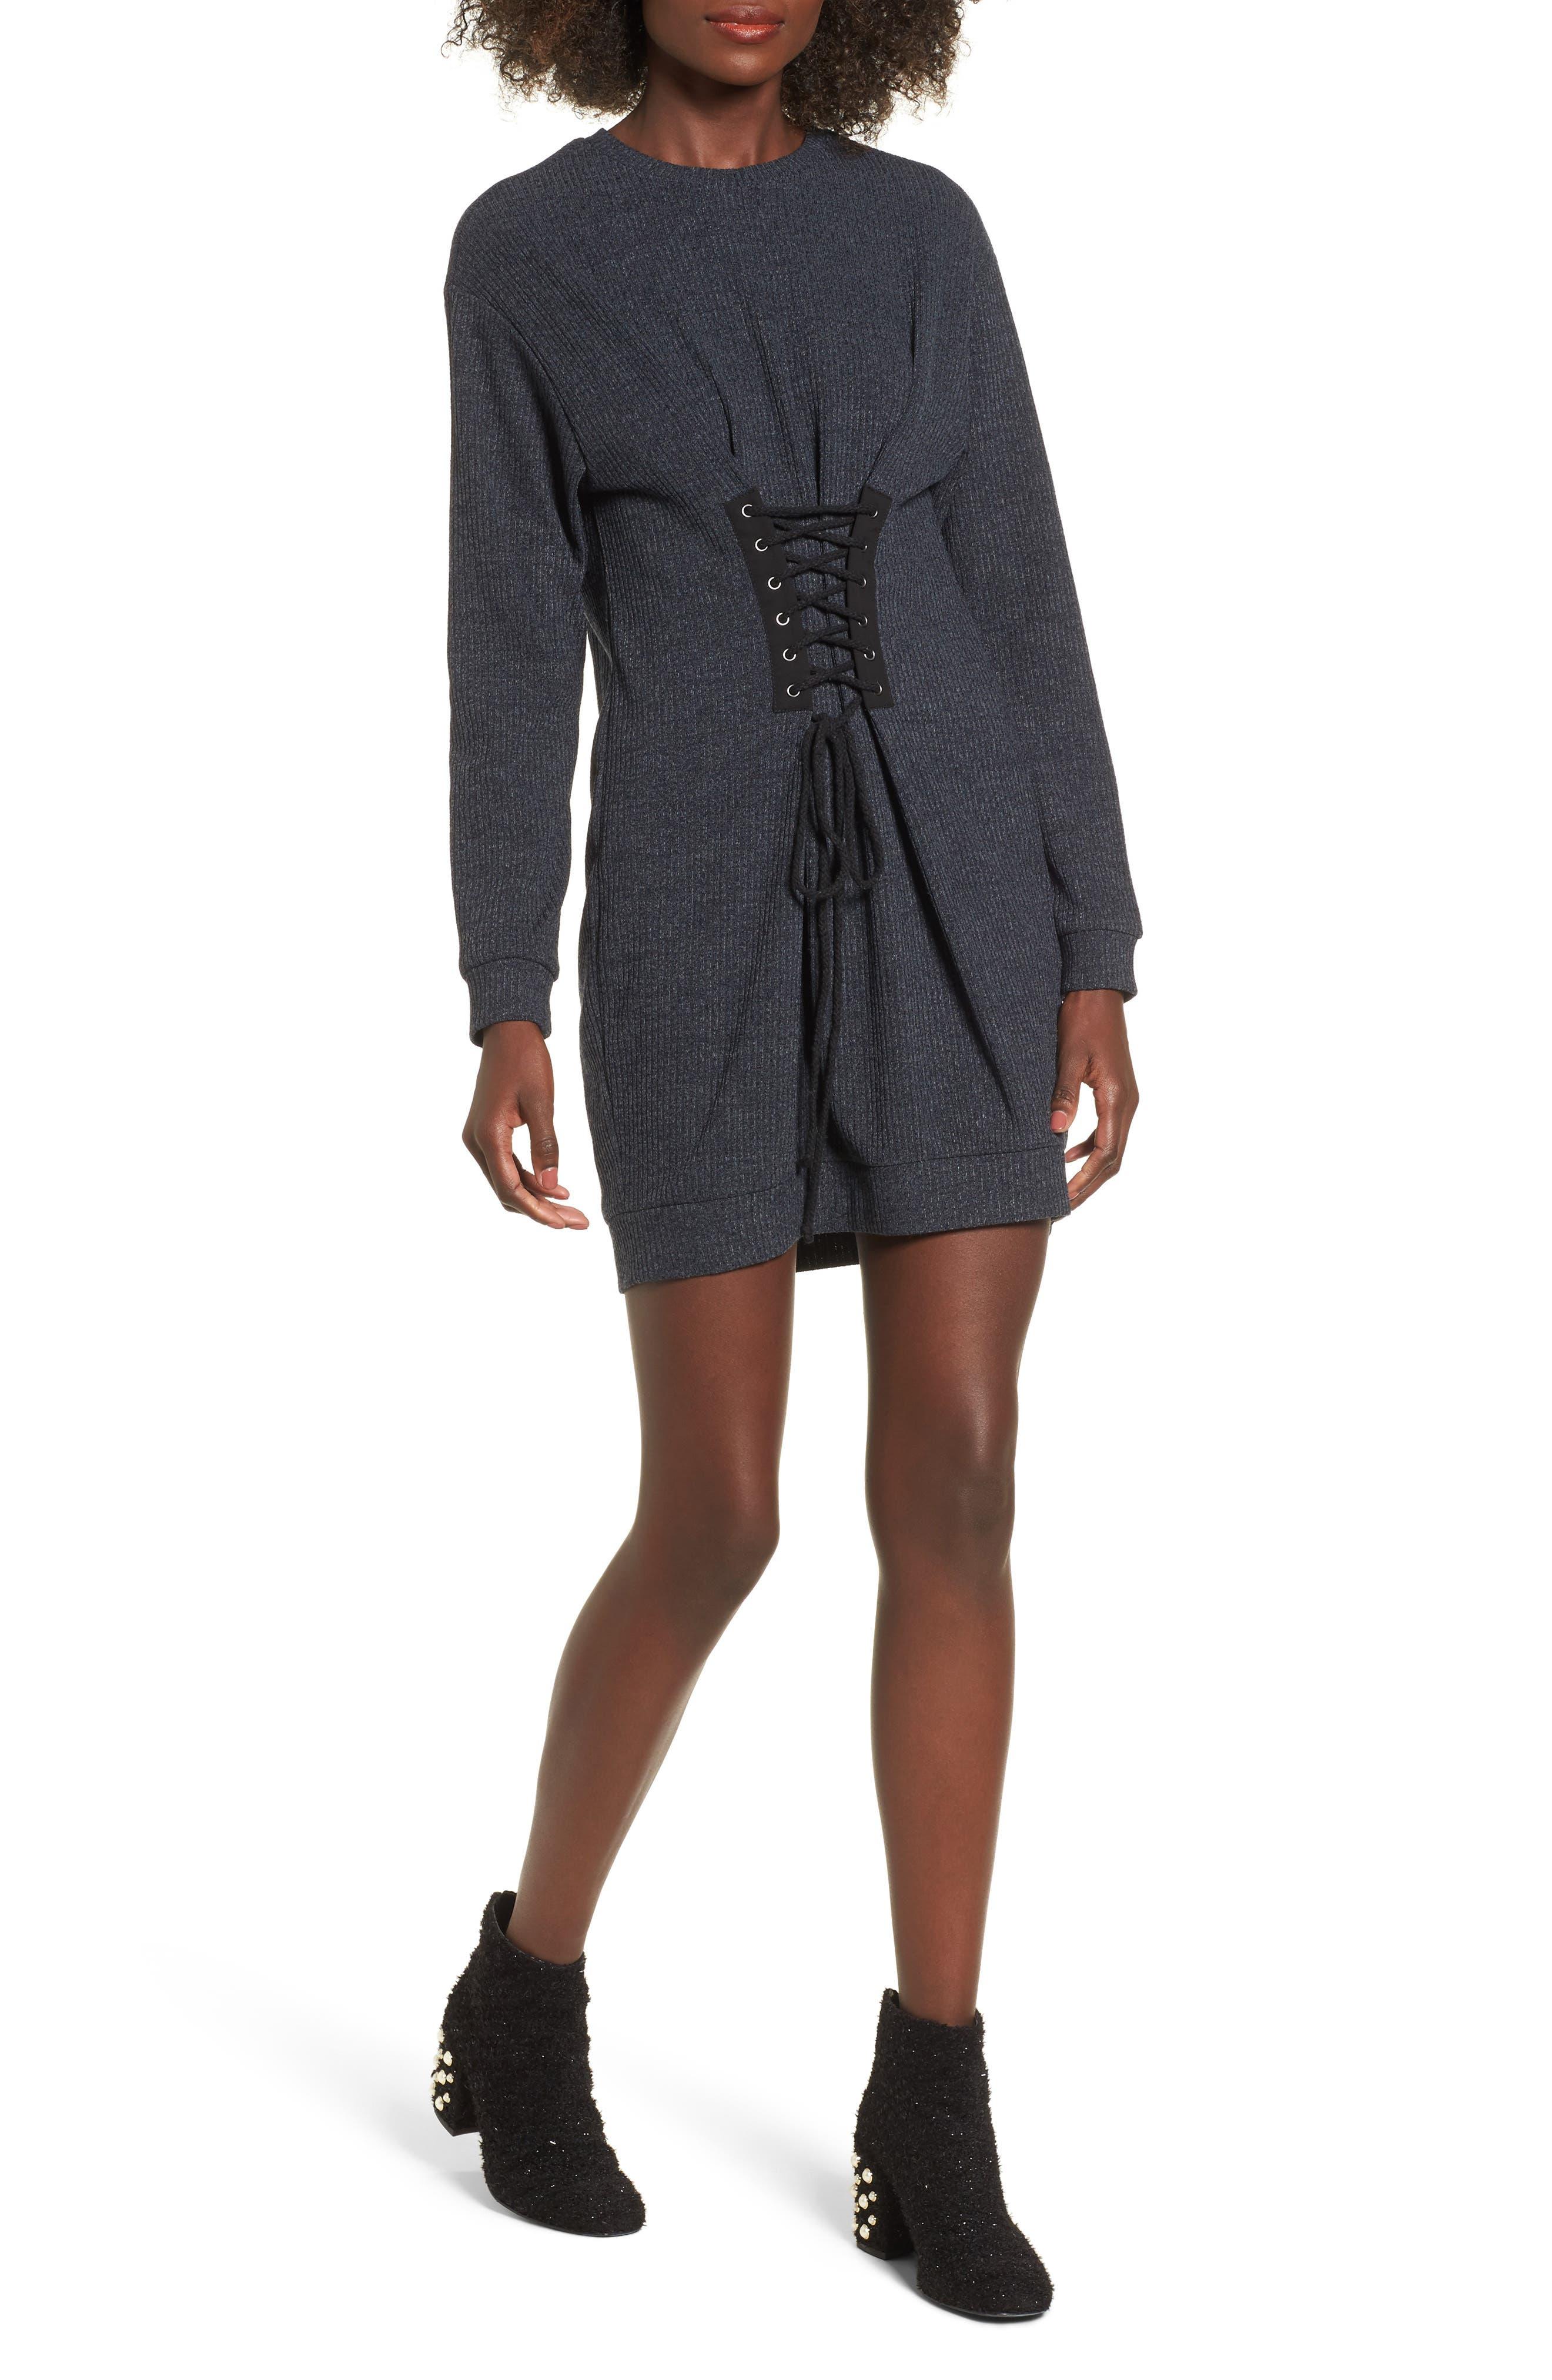 Main Image - WAYF Corset Detail Sweatshirt Dress